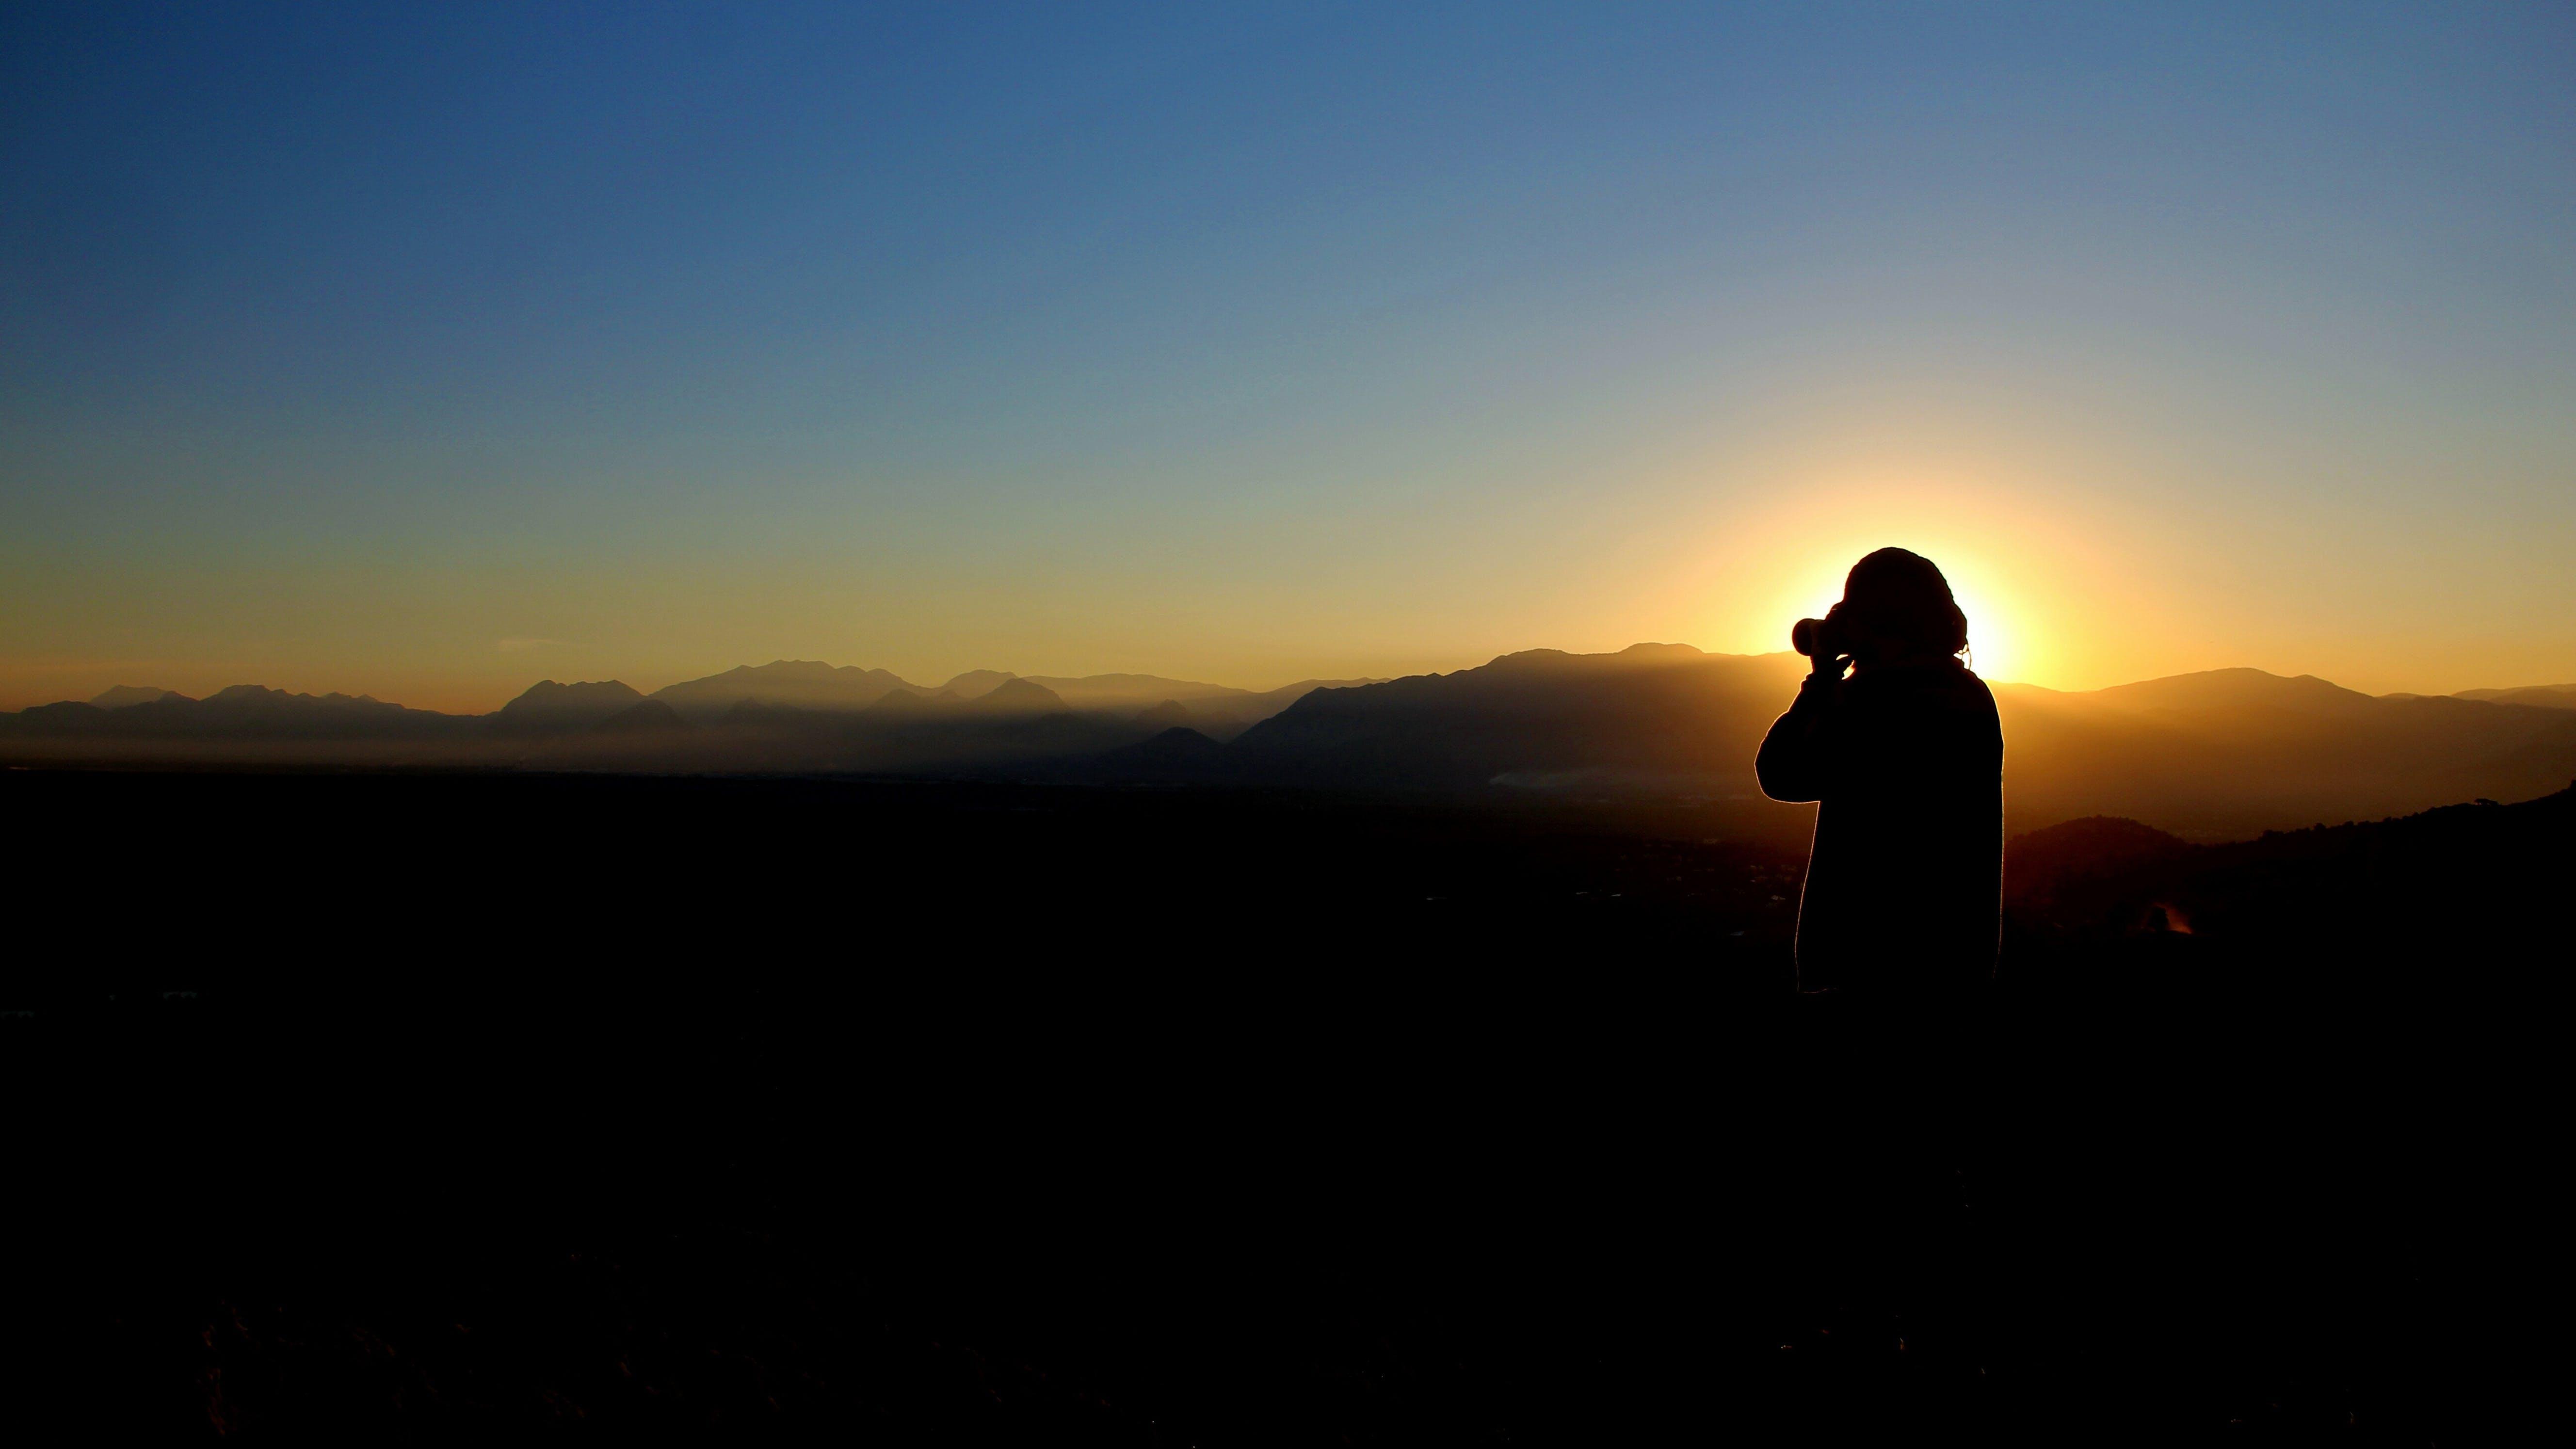 Free stock photo of dawn, landscape, sky, man